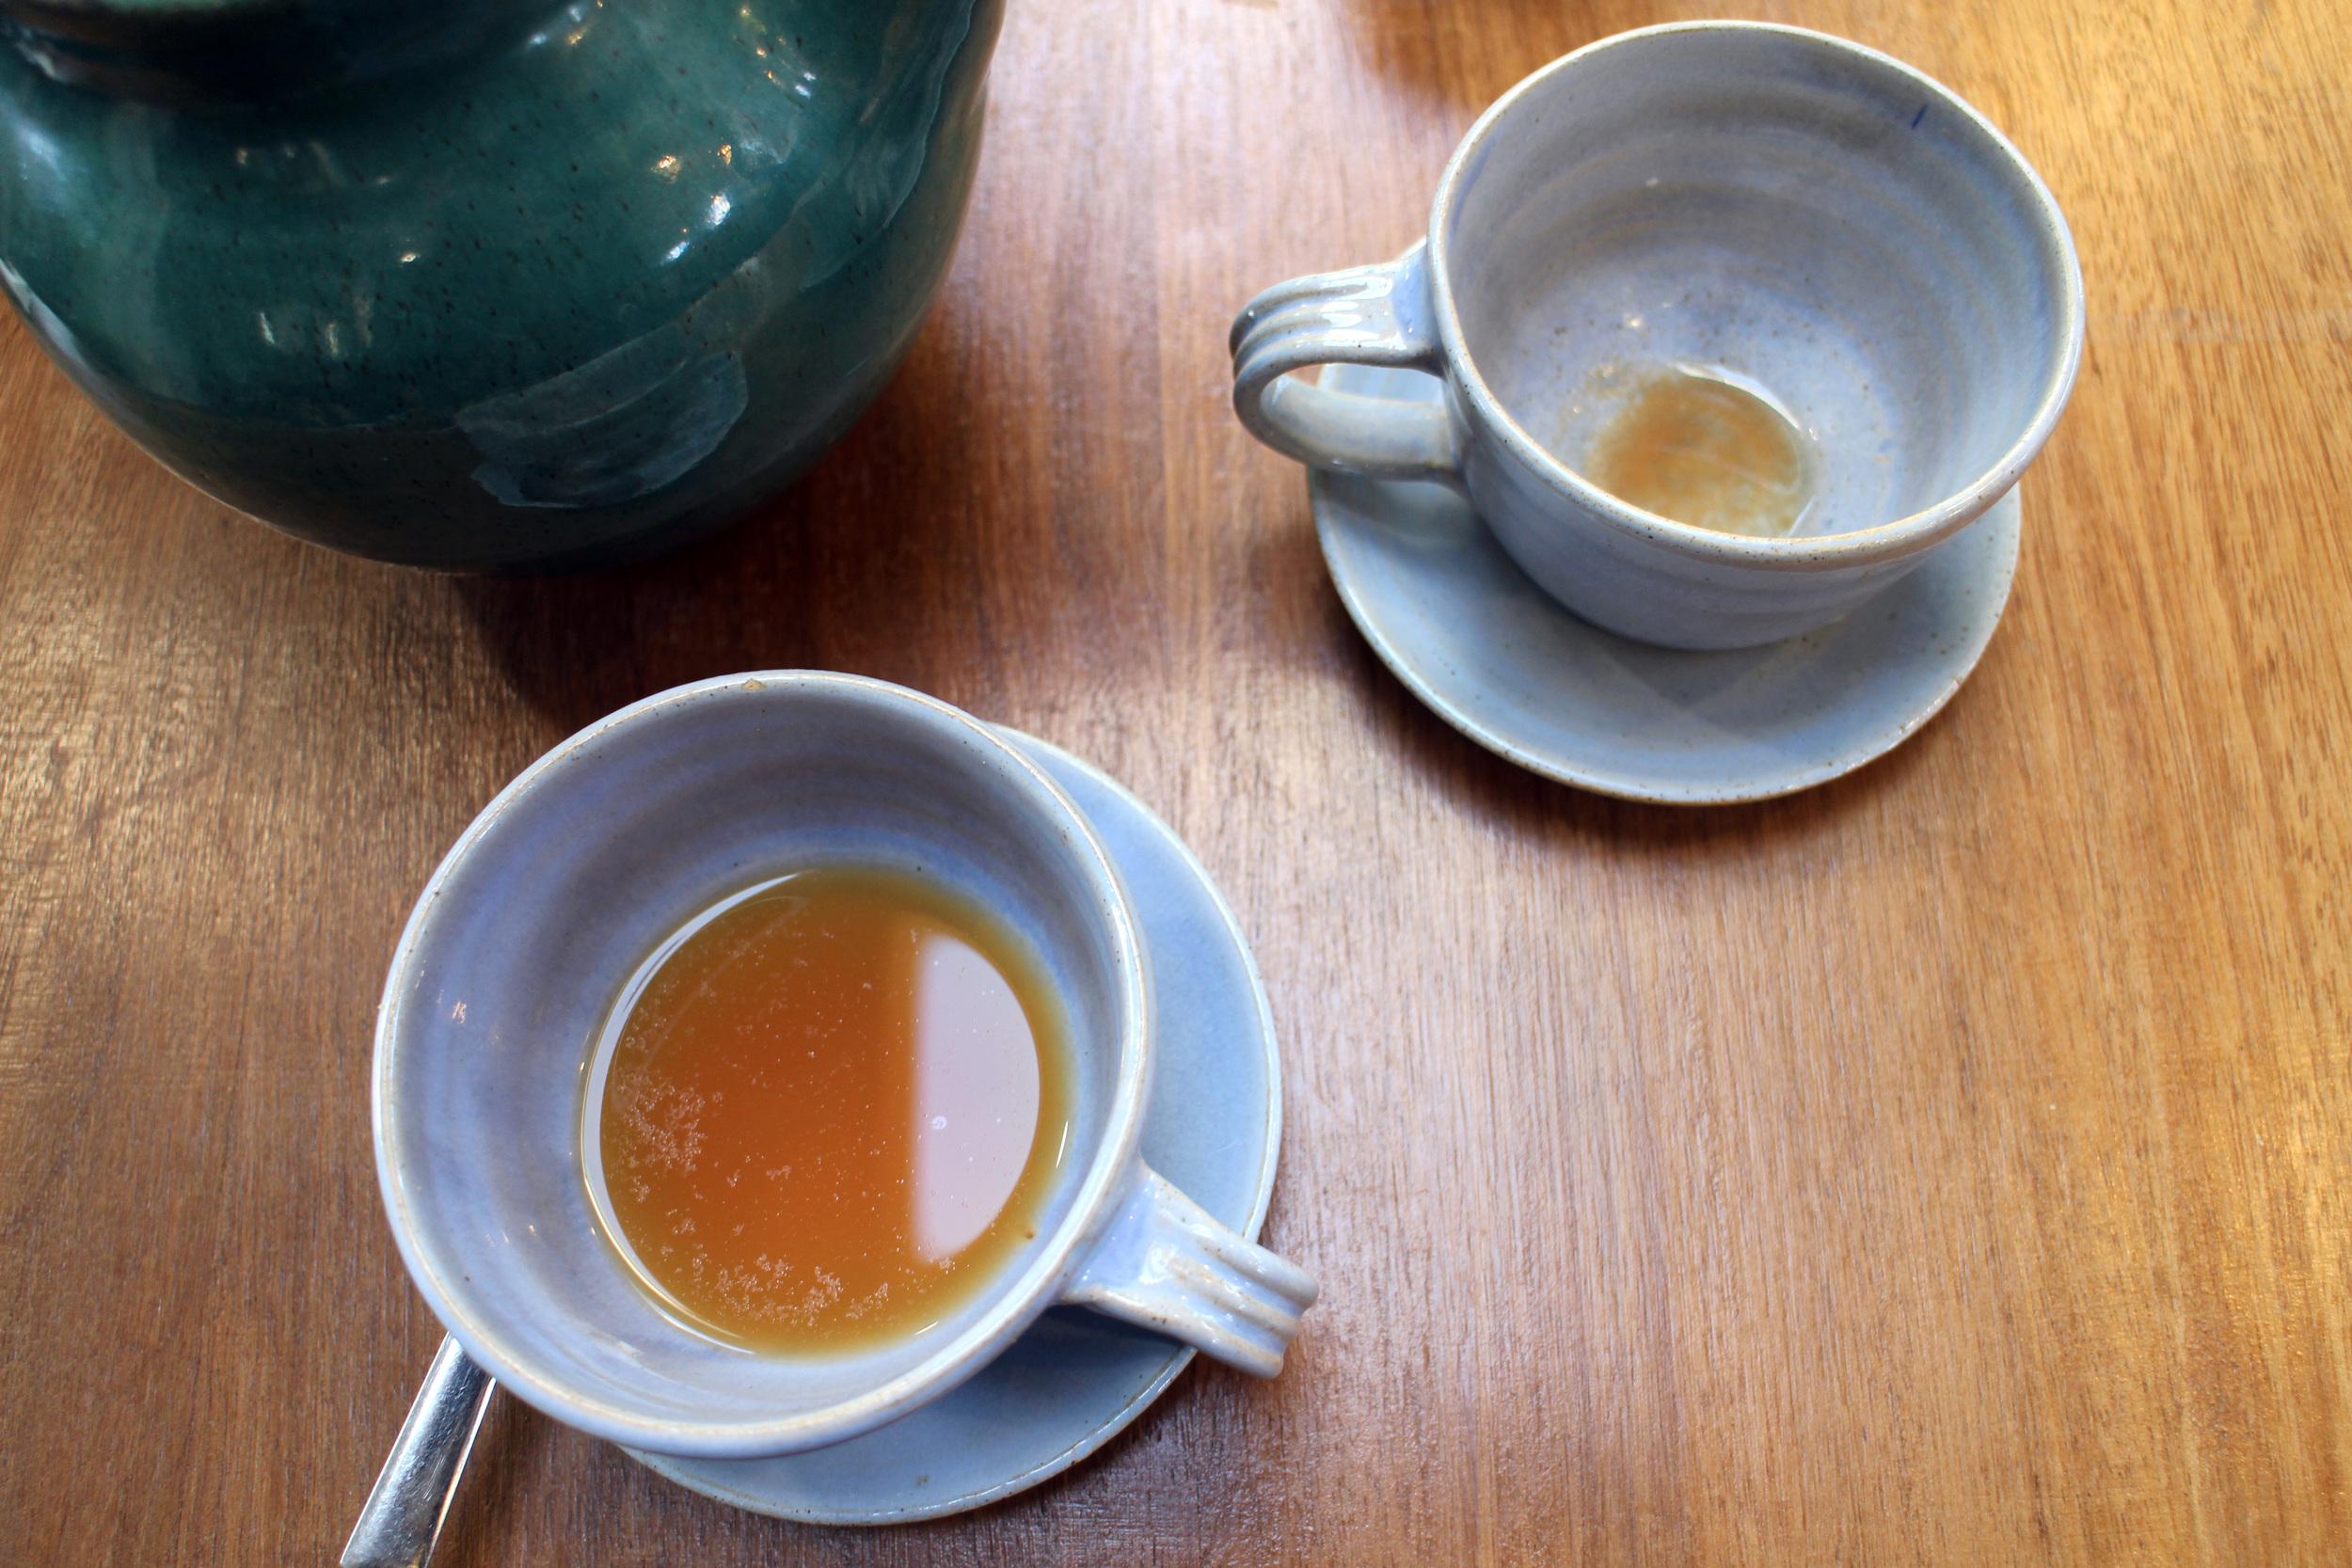 FEBRUARY: Tea at Pilling Pottery